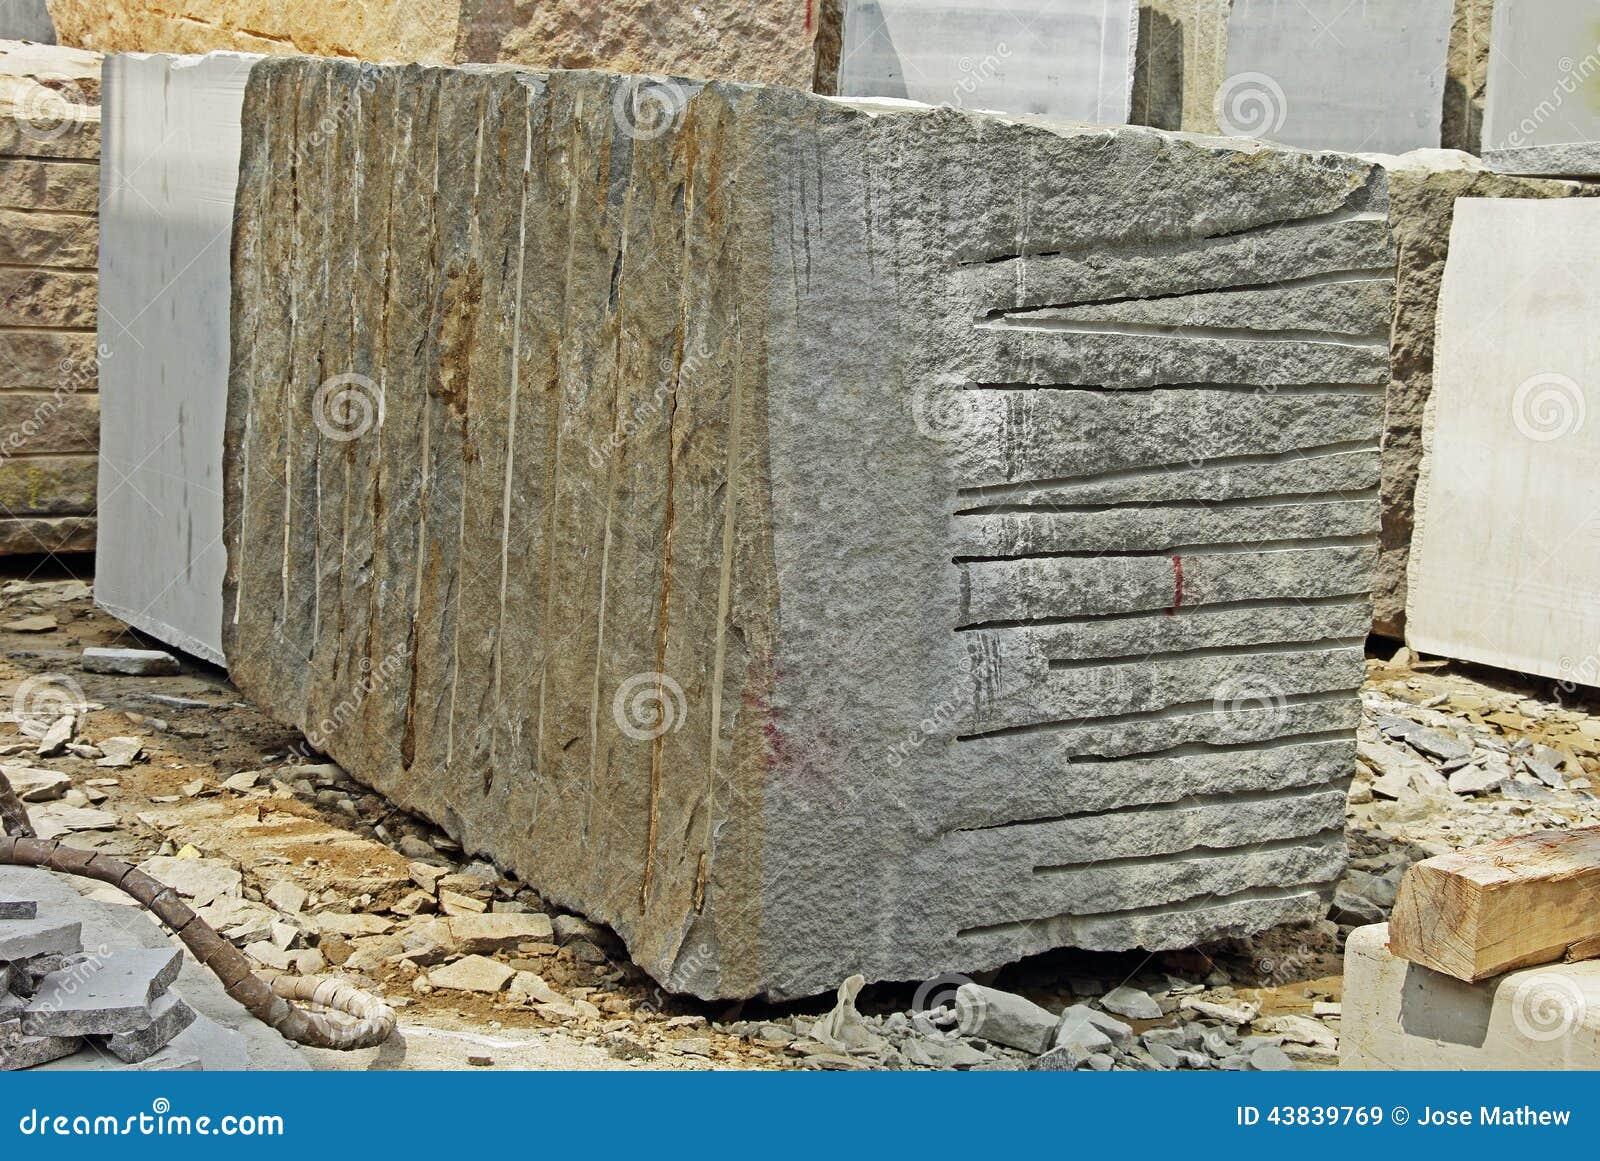 Huge Granite Block Stock Image Image Of Break Mining